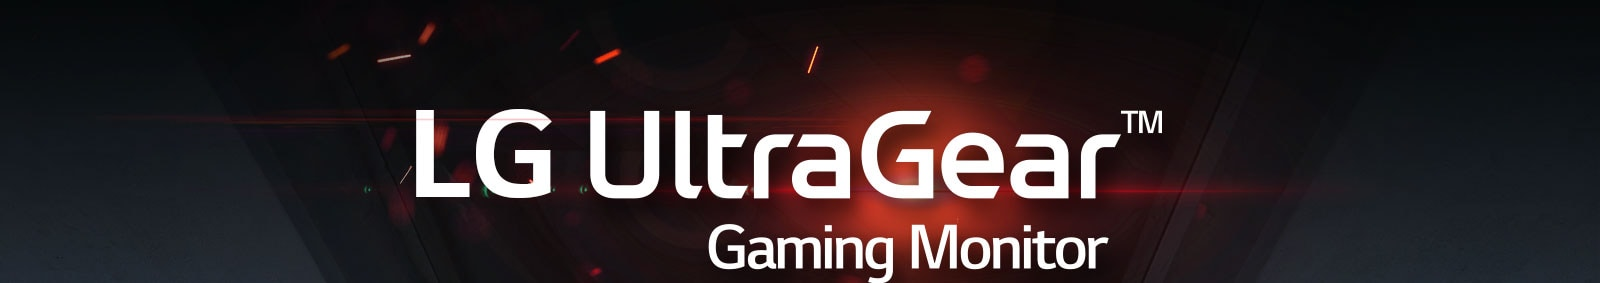 D01_MNT-27GL850-01-1-UltraGear-Desktop-v8